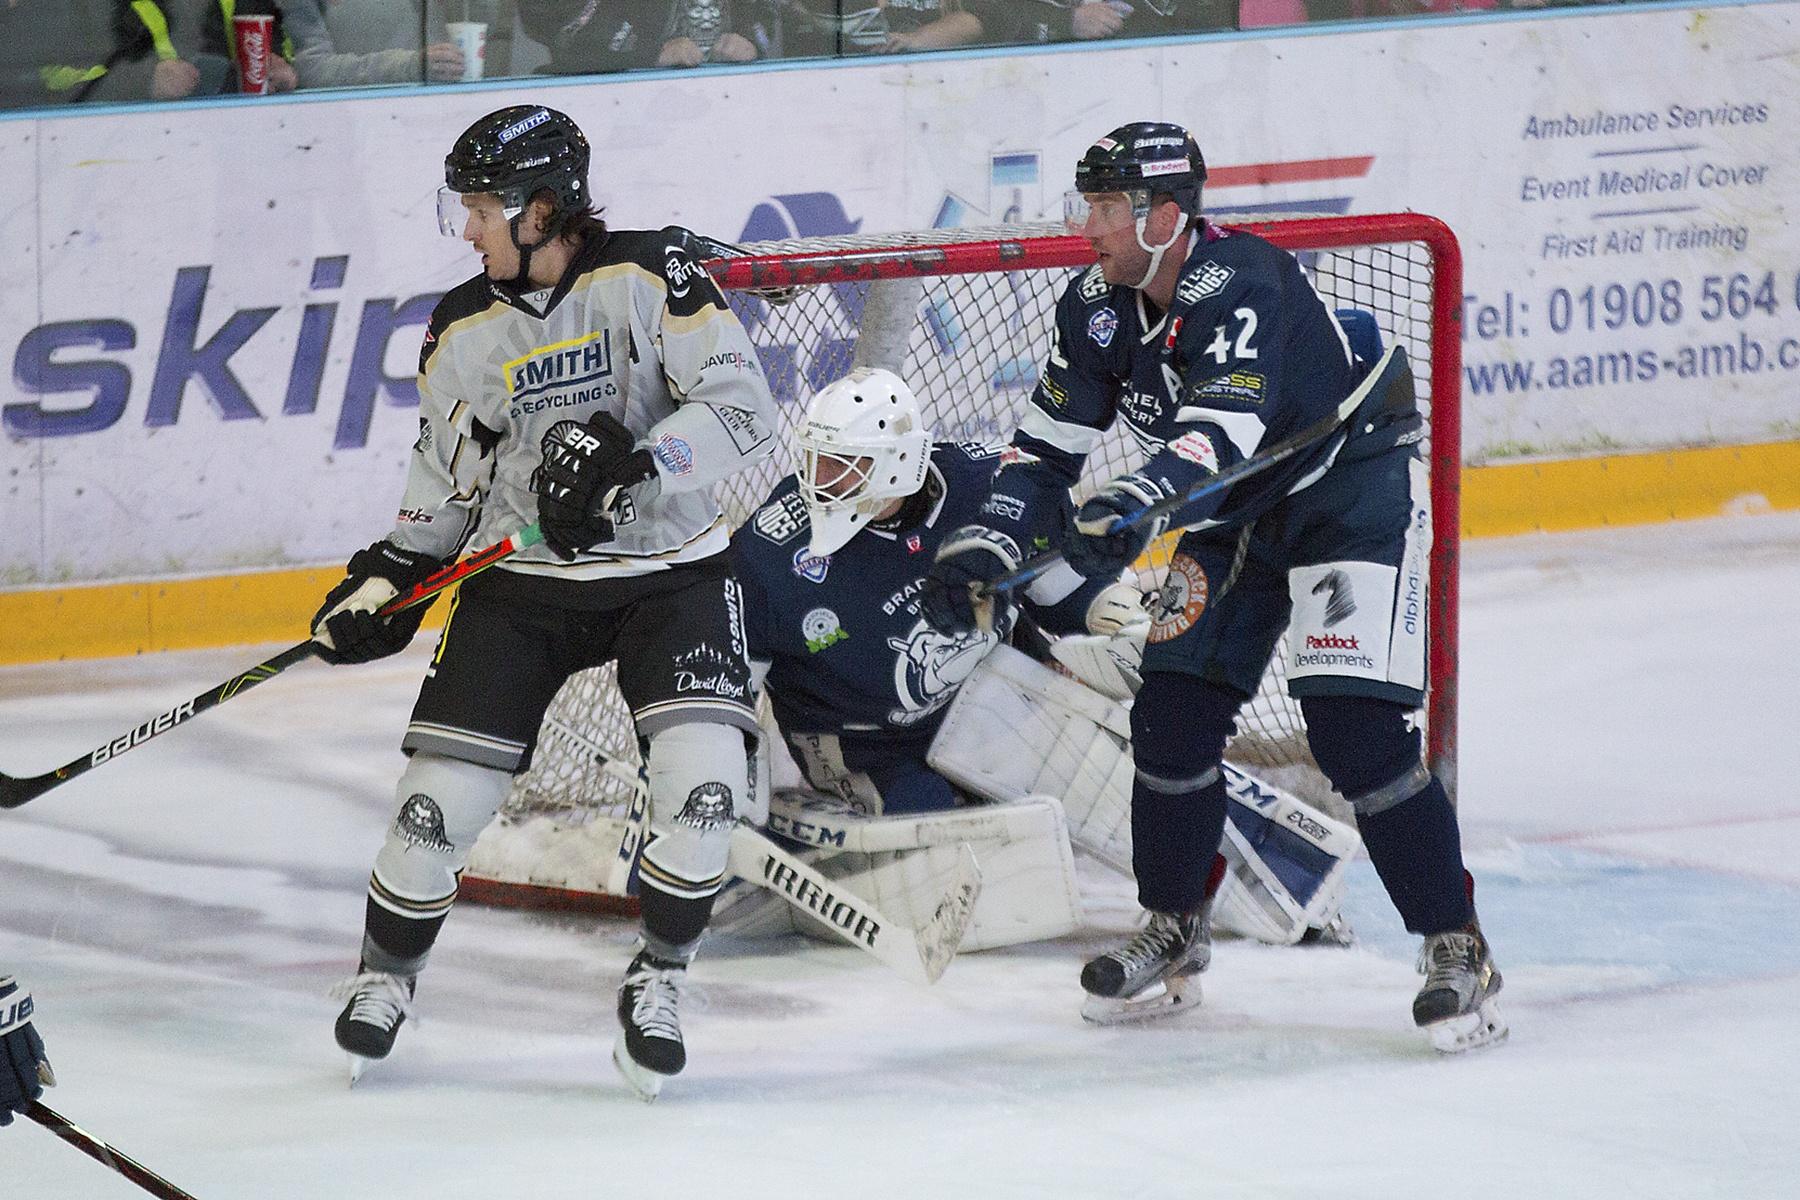 MK Lightning Ice Hockey Top Image